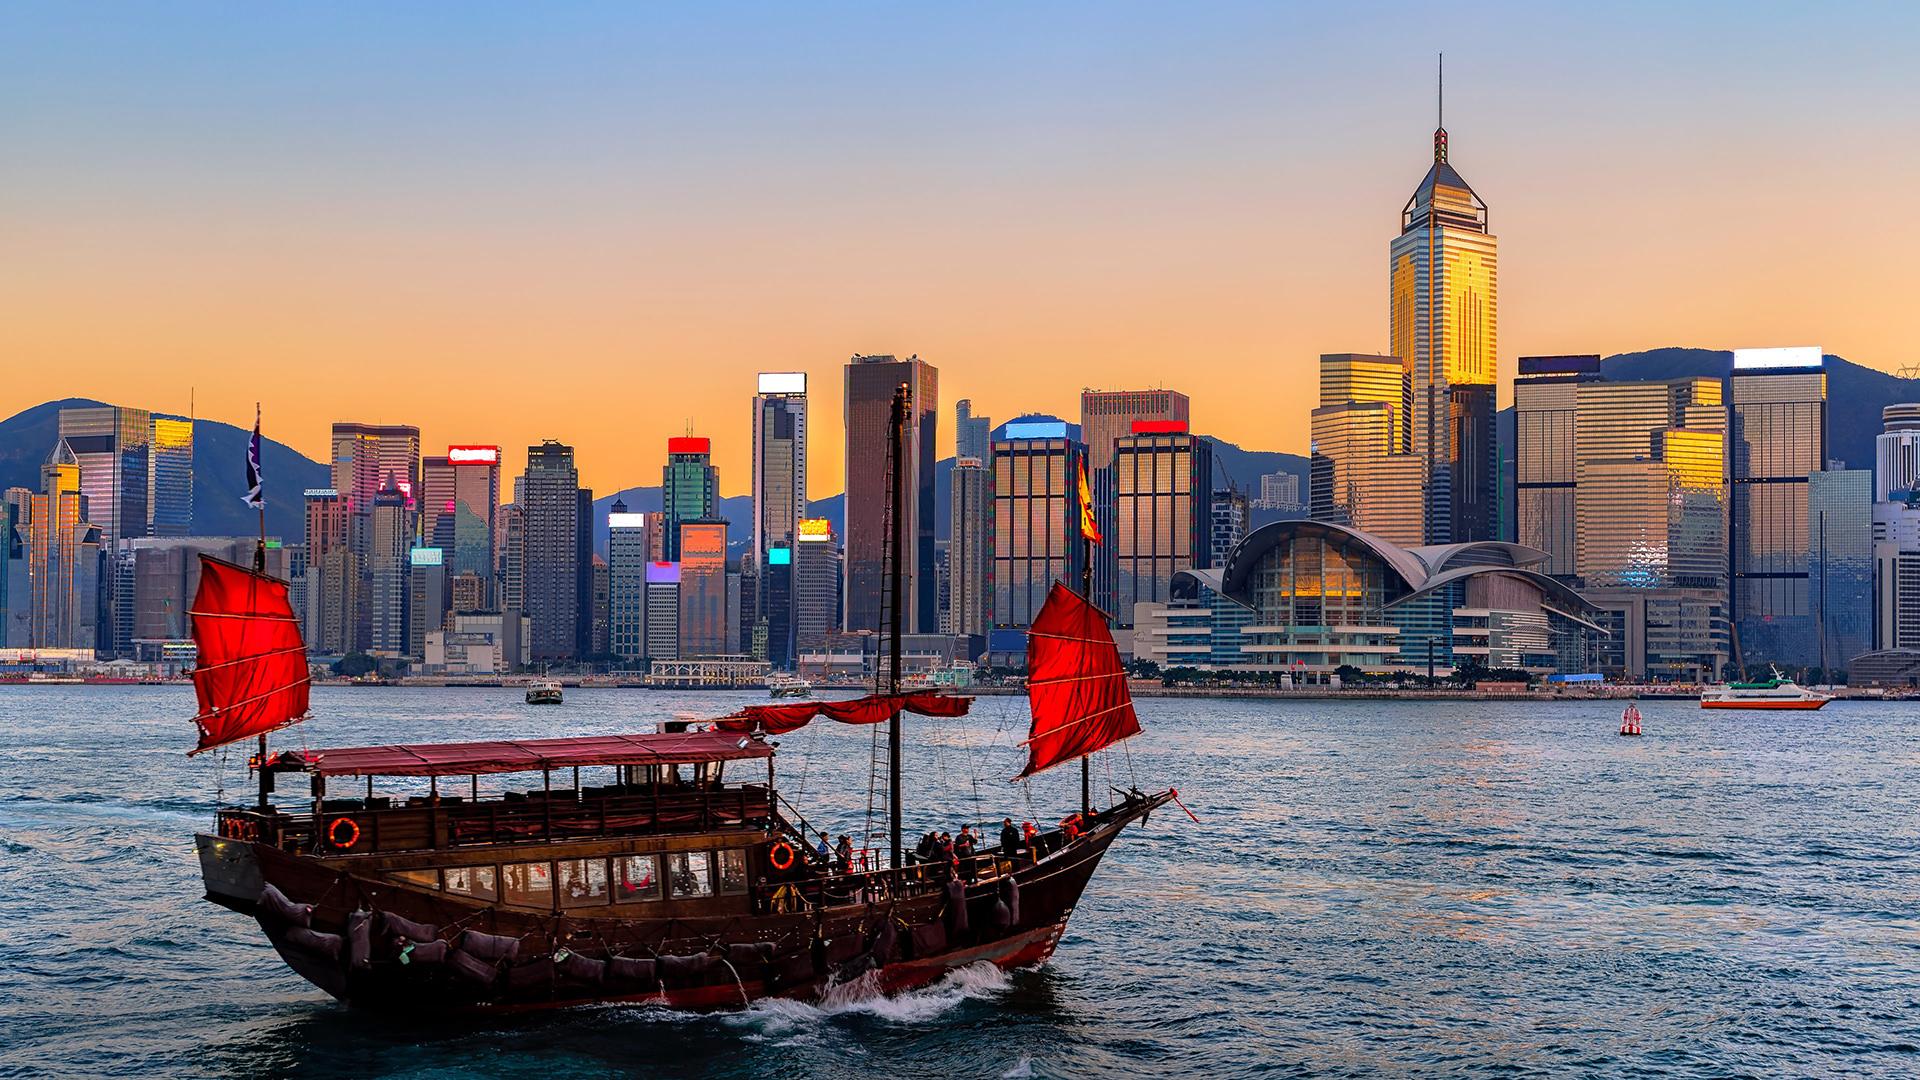 Lokal Deneyimler: Hong Kong, Lan Kwai Fong Bölgesi Geceleri